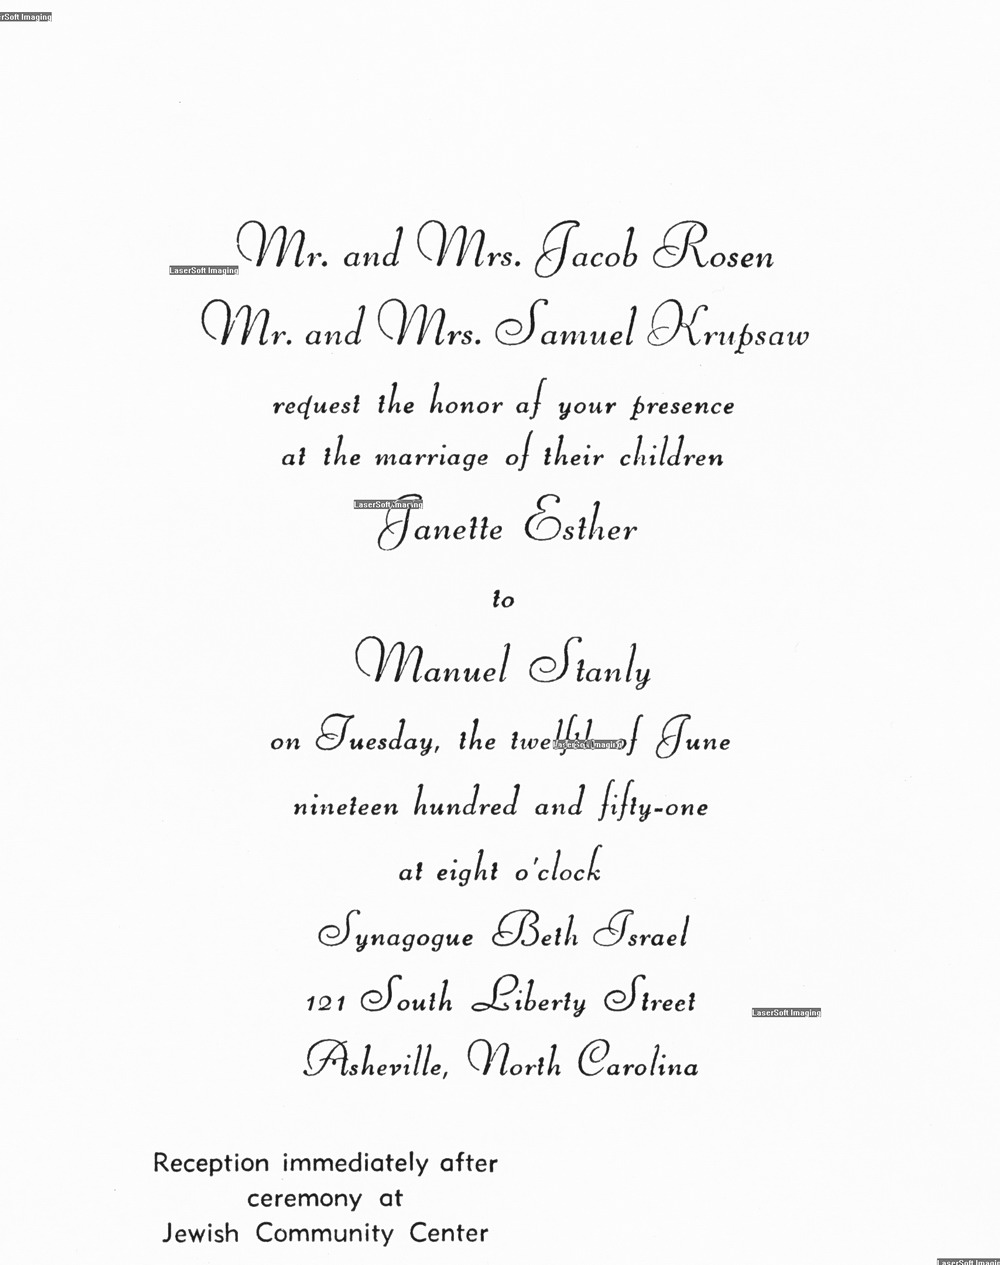 Wedding Invitations For Cheap is amazing invitation design